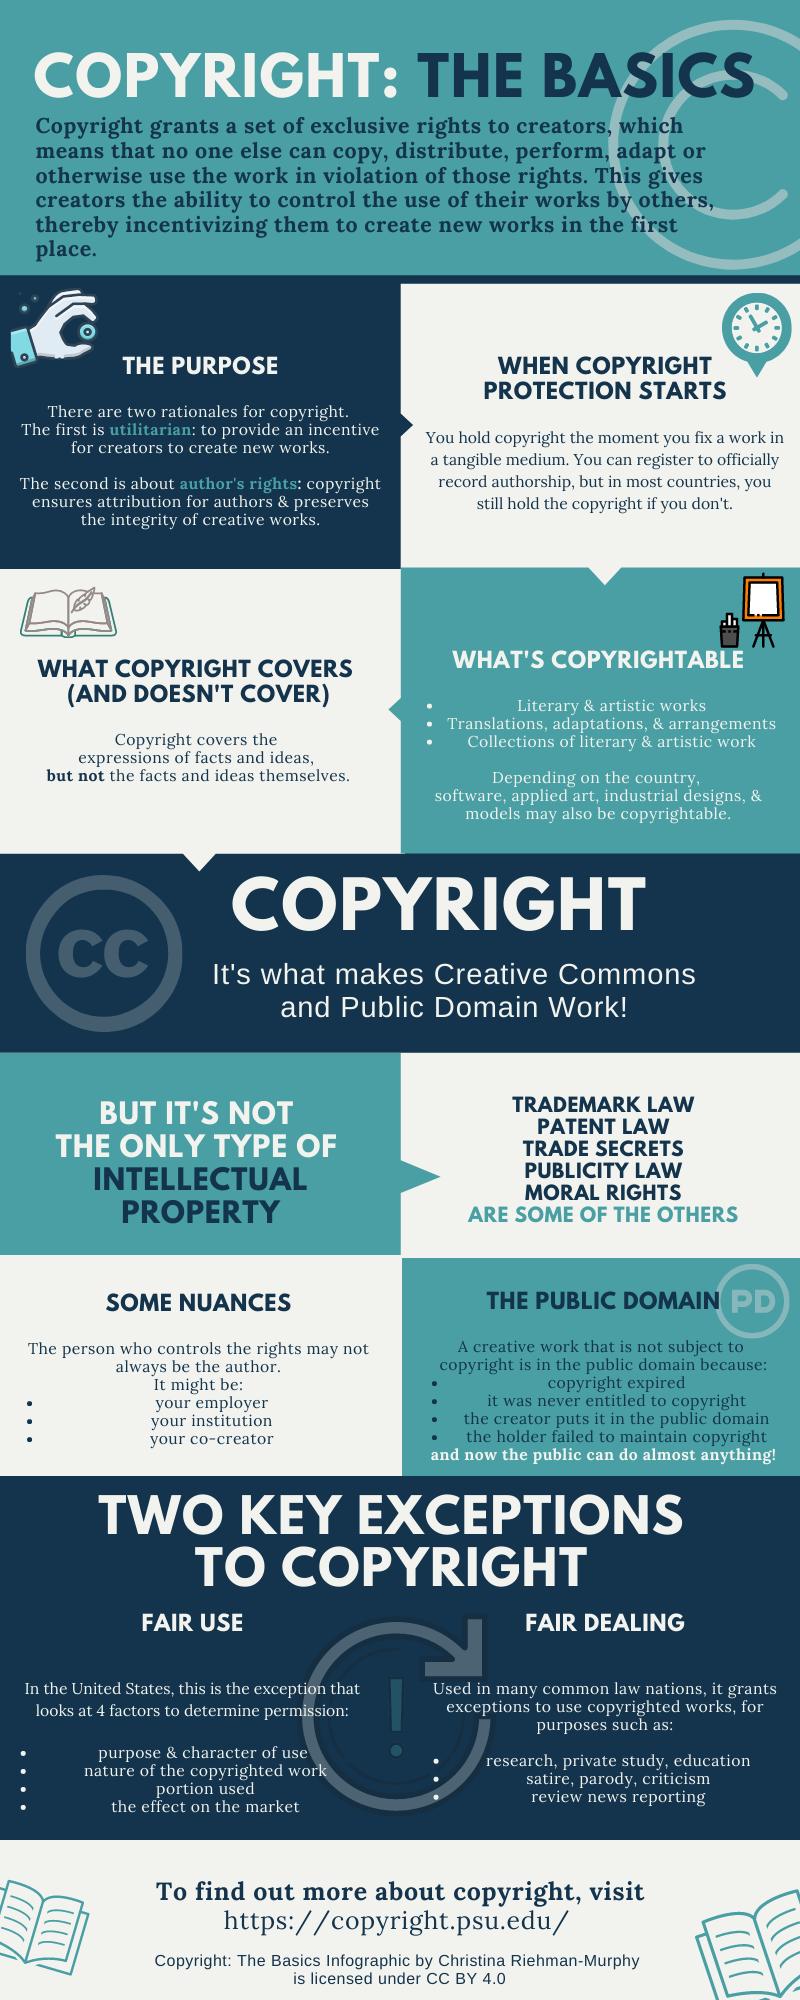 Copyright: The Basics Infographic